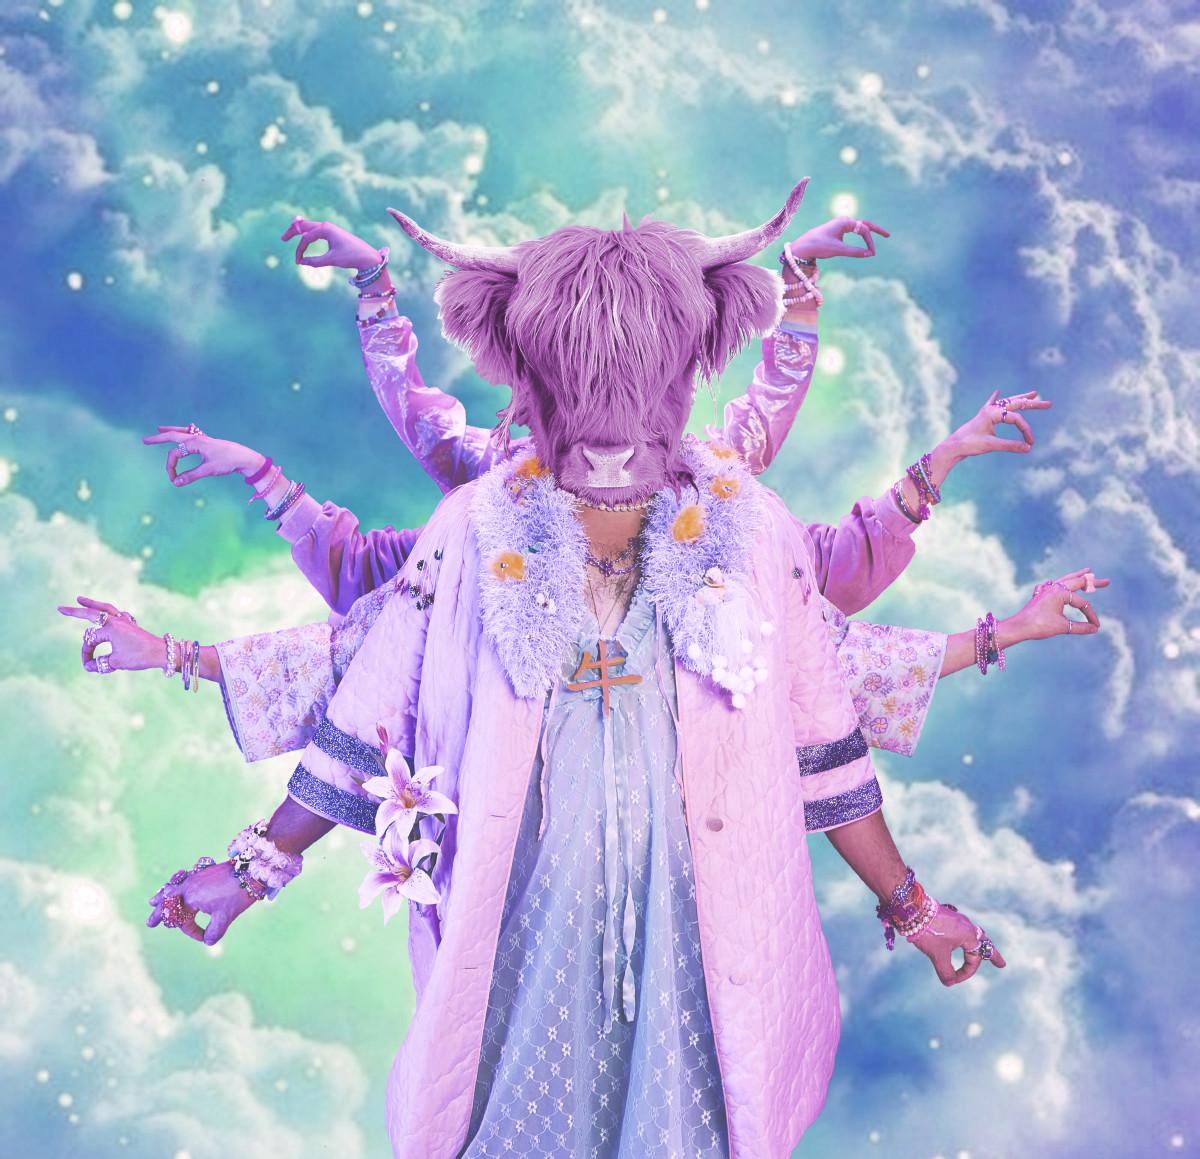 C.O.W. 牛 Logo - Purple Cow on Cloud Background